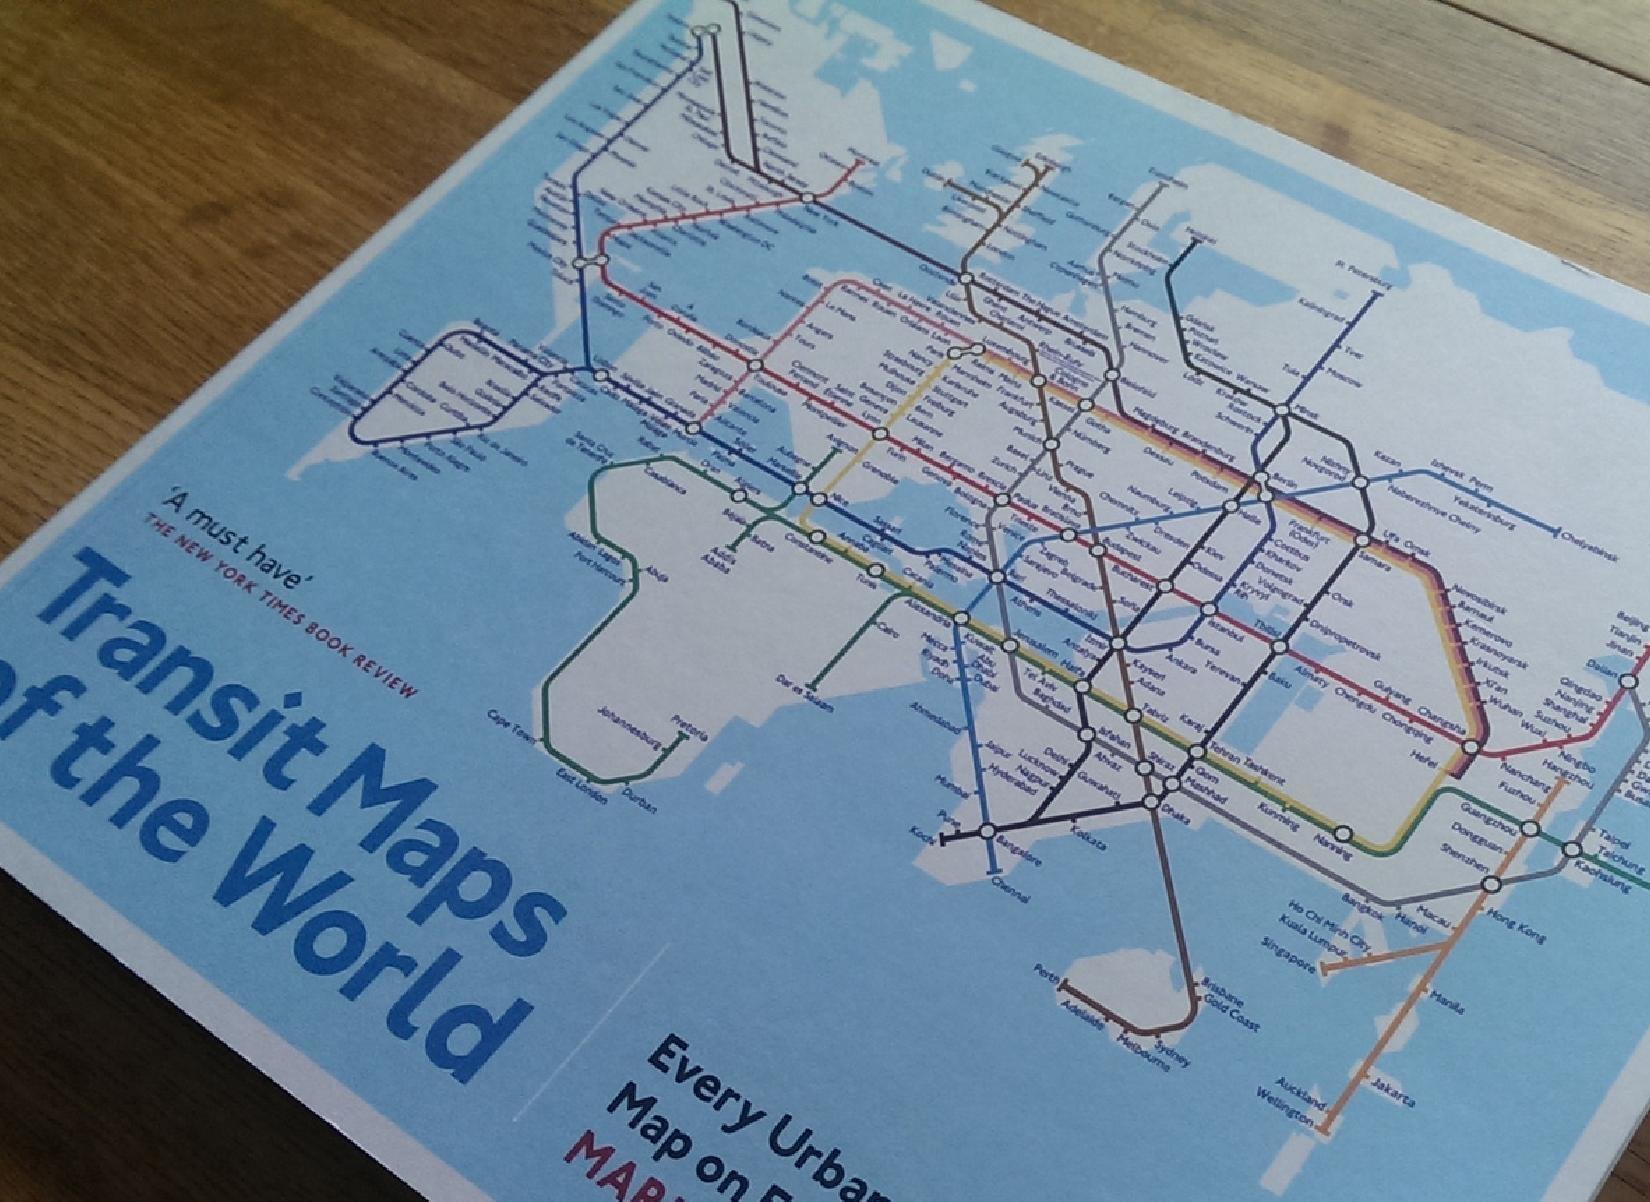 Filea crowd sourced transit map for managuapdf openstreetmap wiki filea crowd sourced transit map for managuapdf gumiabroncs Choice Image